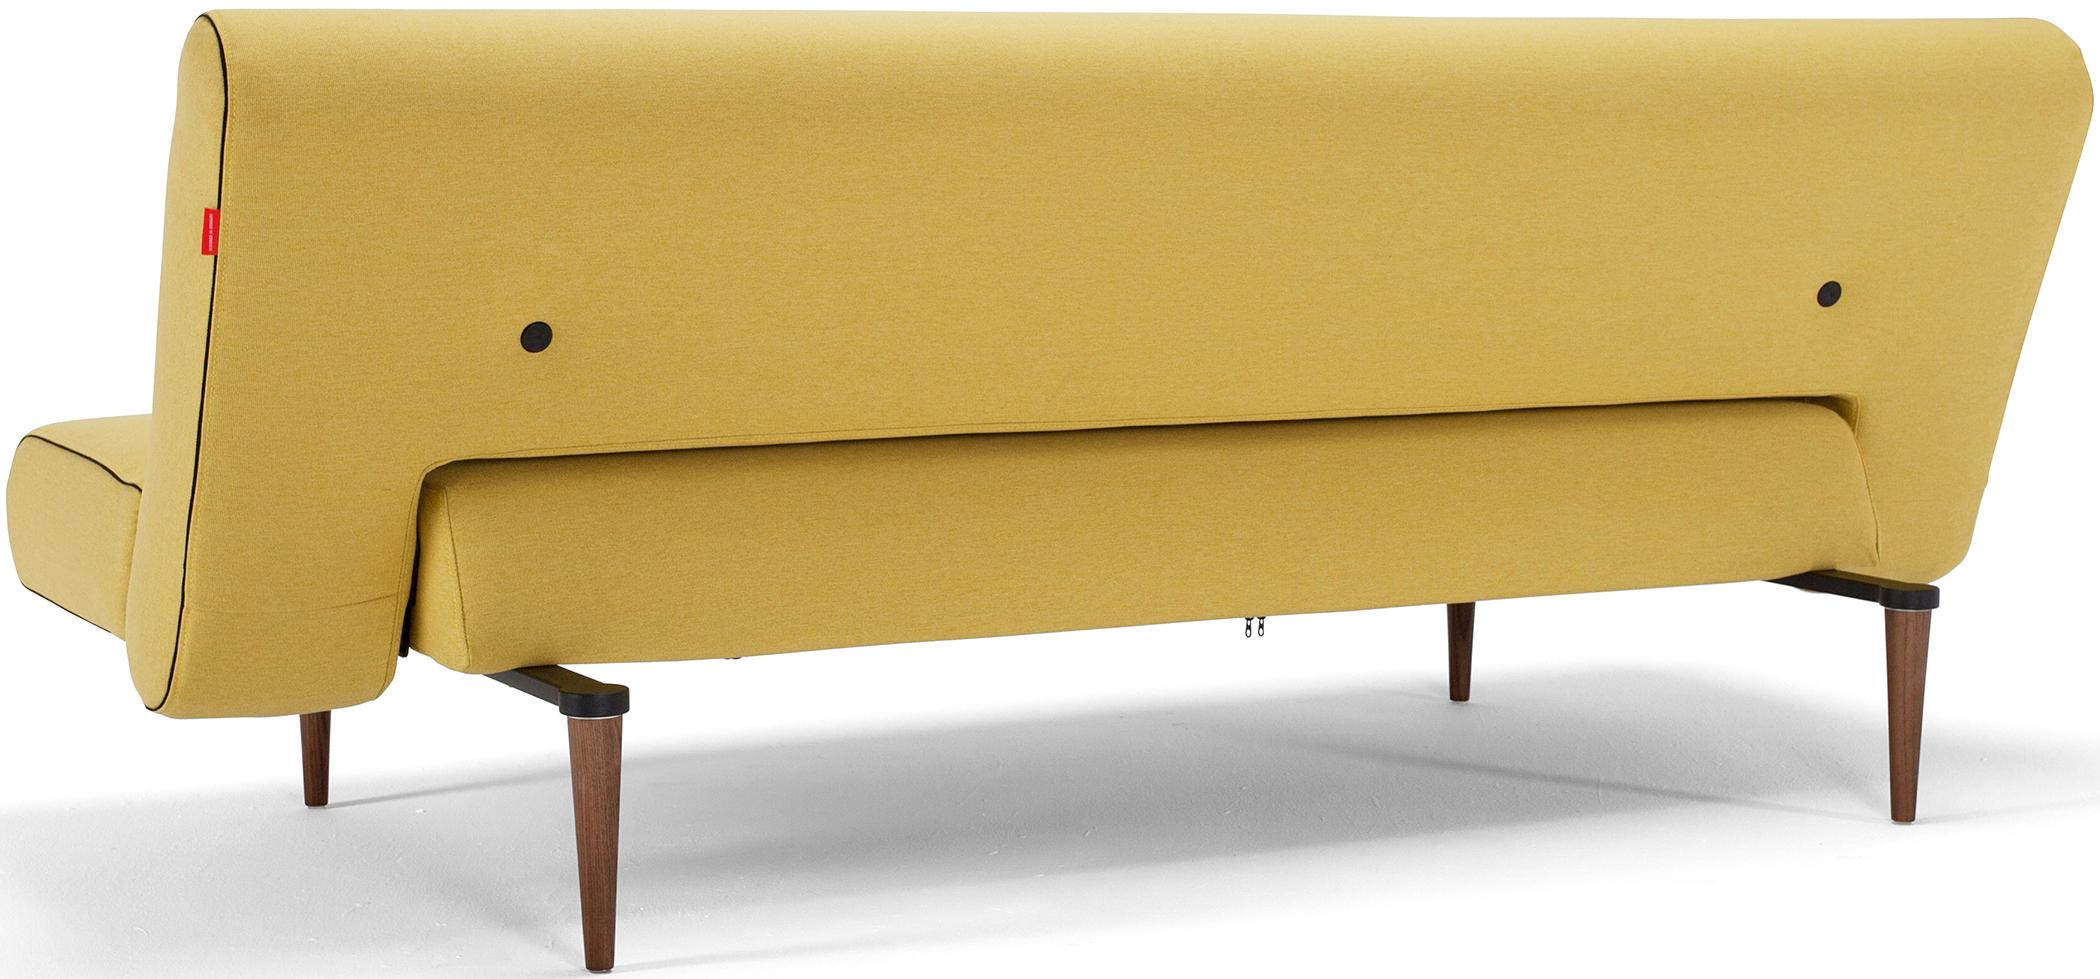 unfurl sofa bed mustard yellow